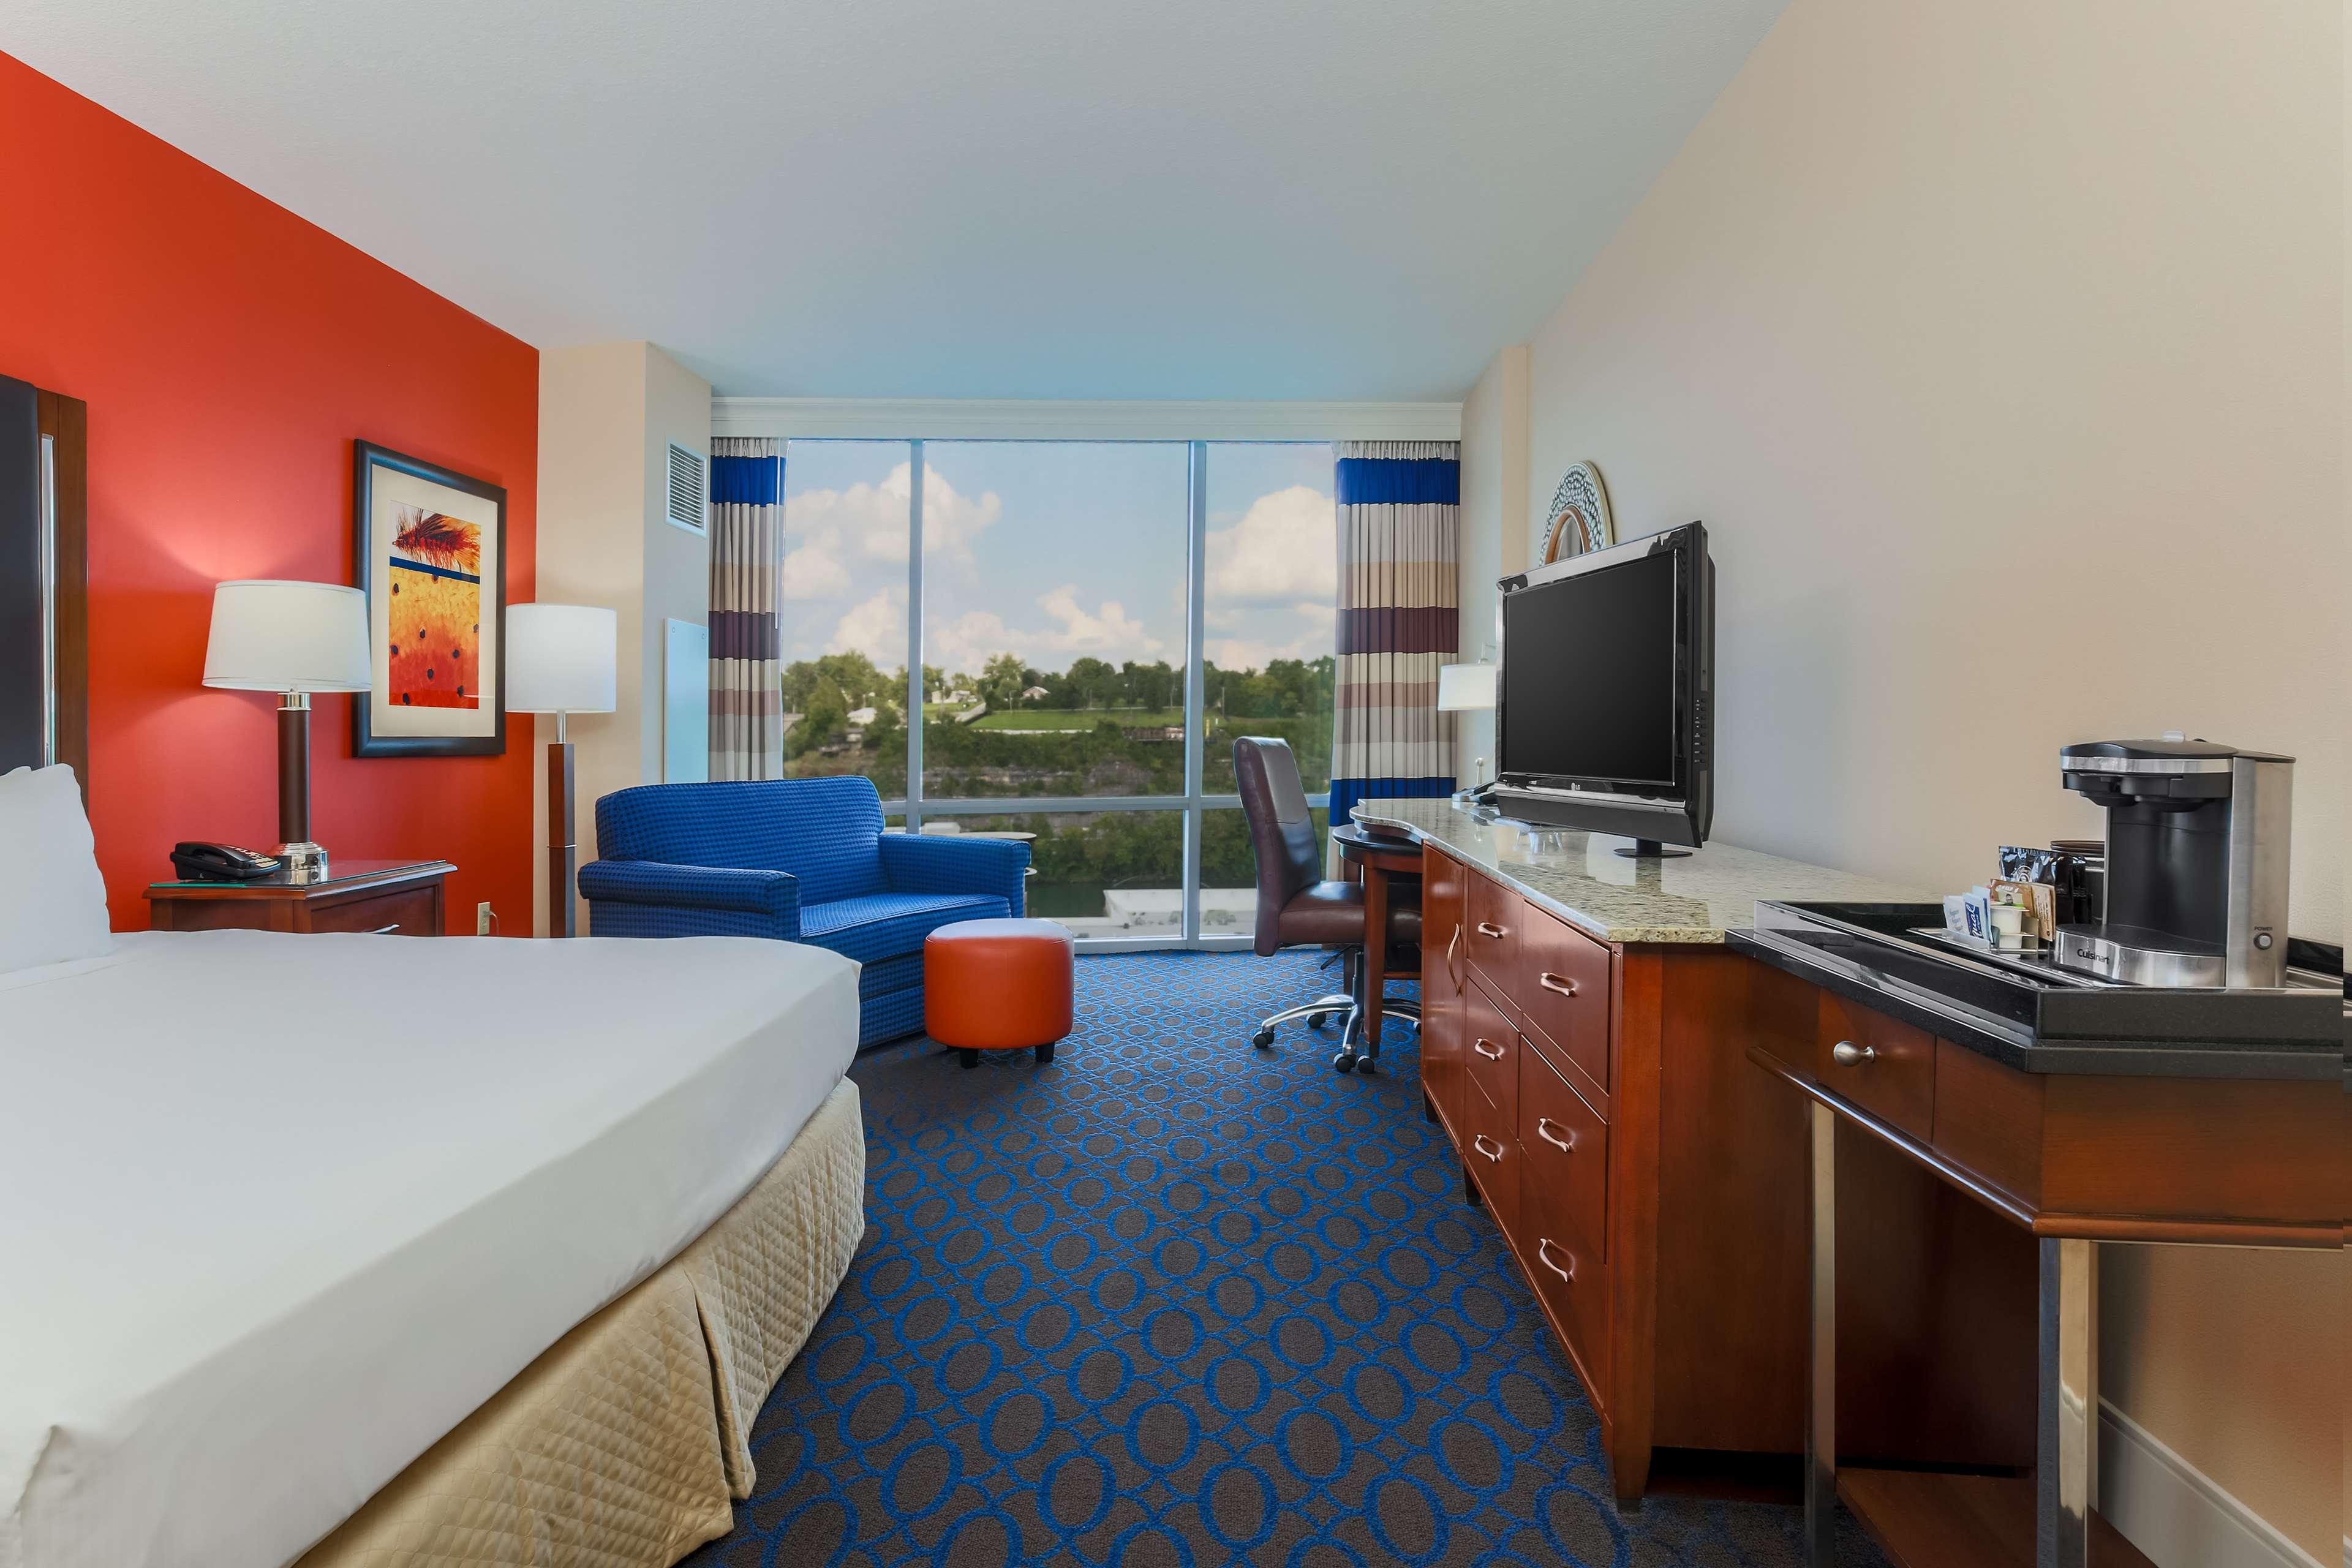 Hilton Branson Convention Center image 41